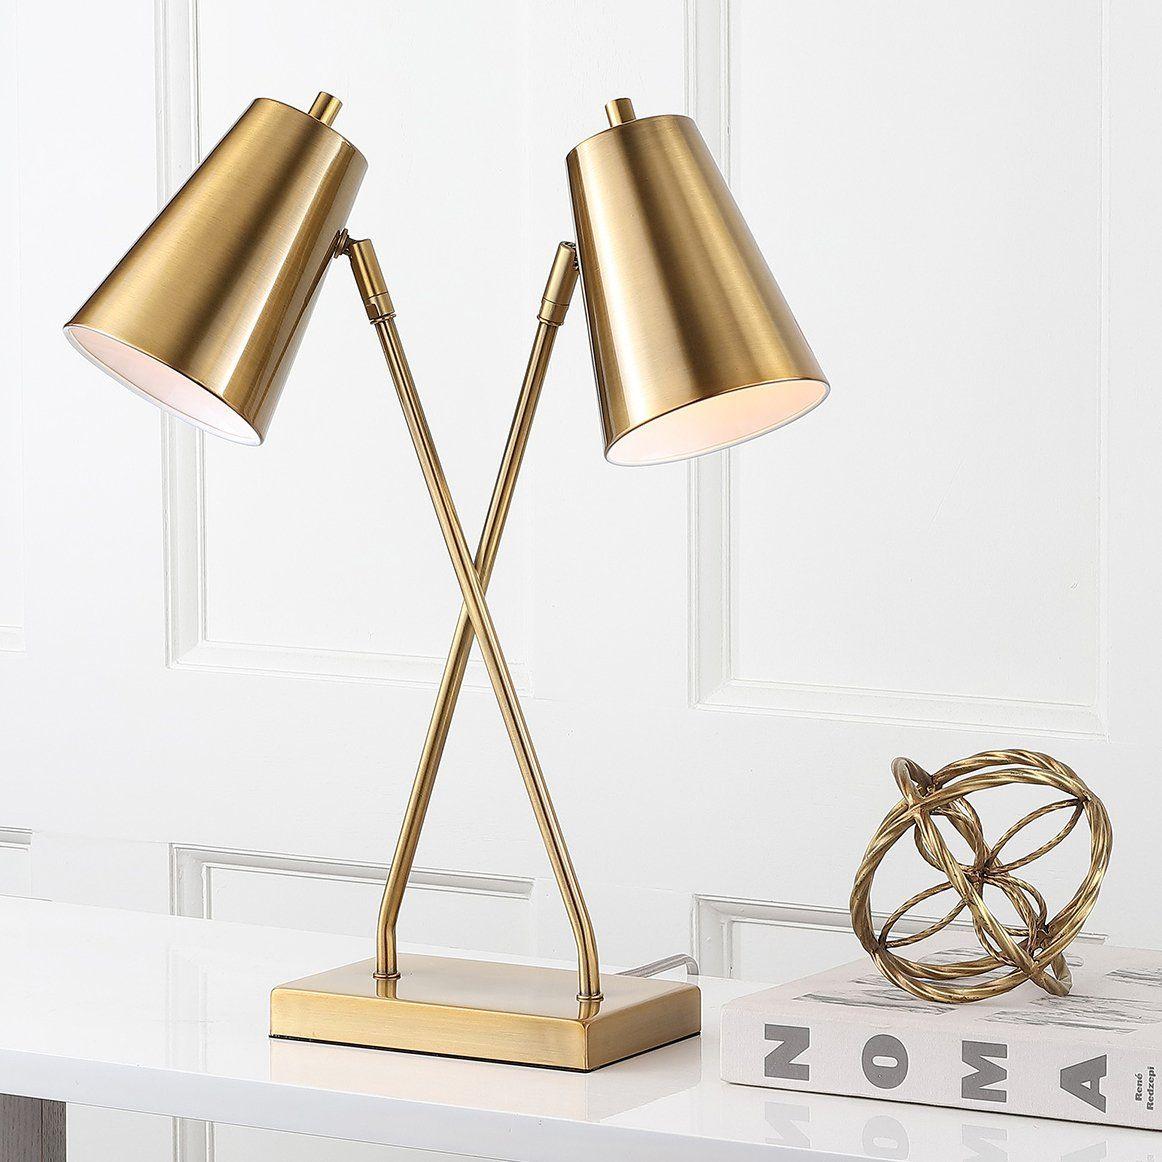 Ghent Desk Lamp In 2021 Gold Table Lamp Lamp Desk Lamp